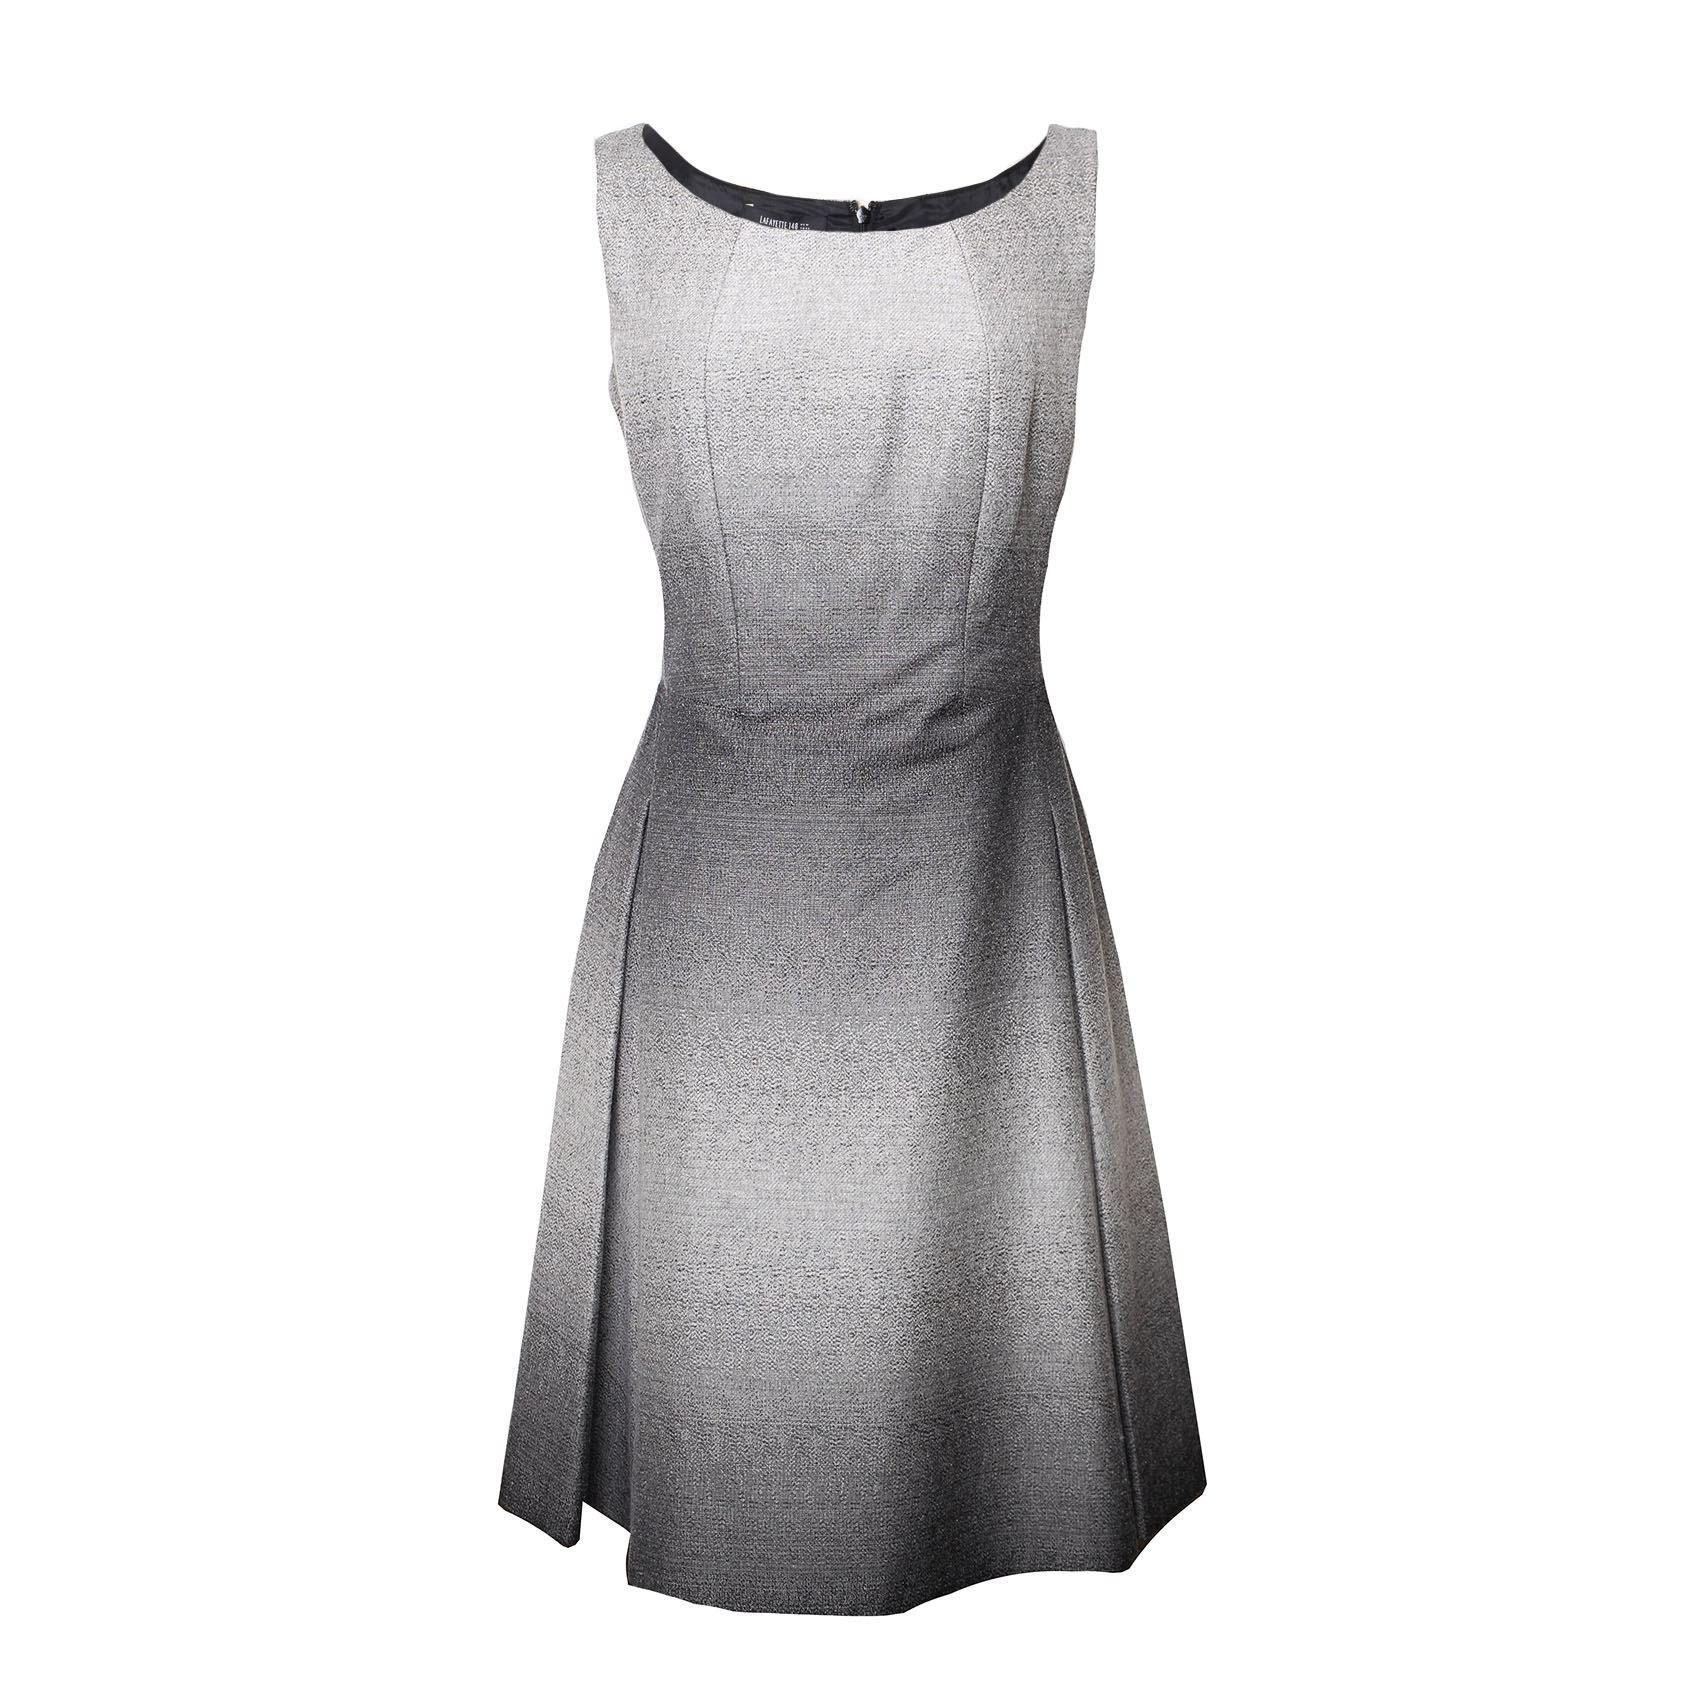 Lafayette 148 Size 8 Grey Ombre Dress